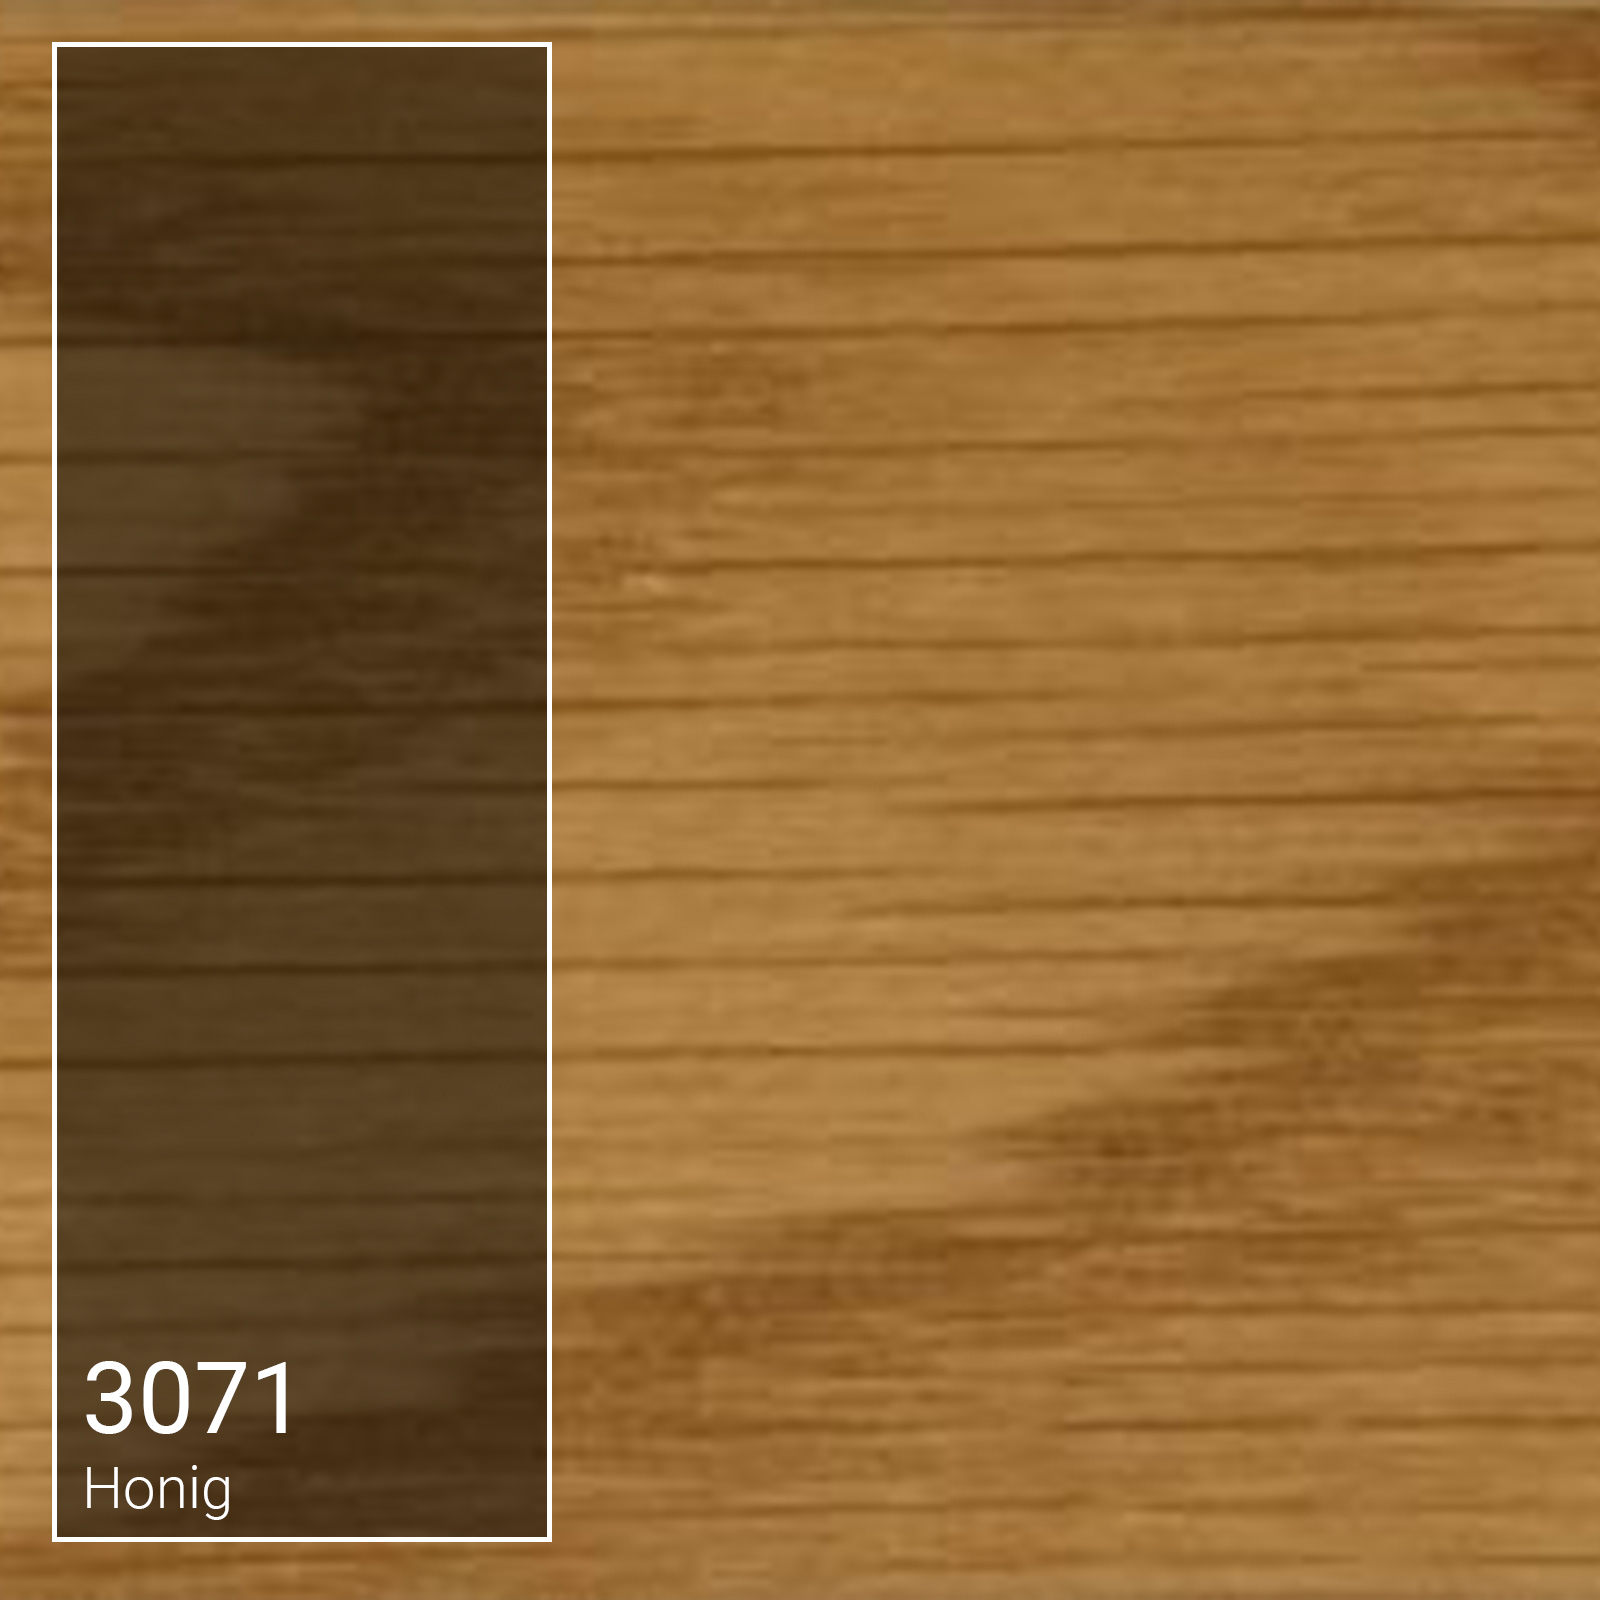 osmo hartwachs l hartwachs l high solid natur l original 3032 3062 ab 21 90 l ebay. Black Bedroom Furniture Sets. Home Design Ideas